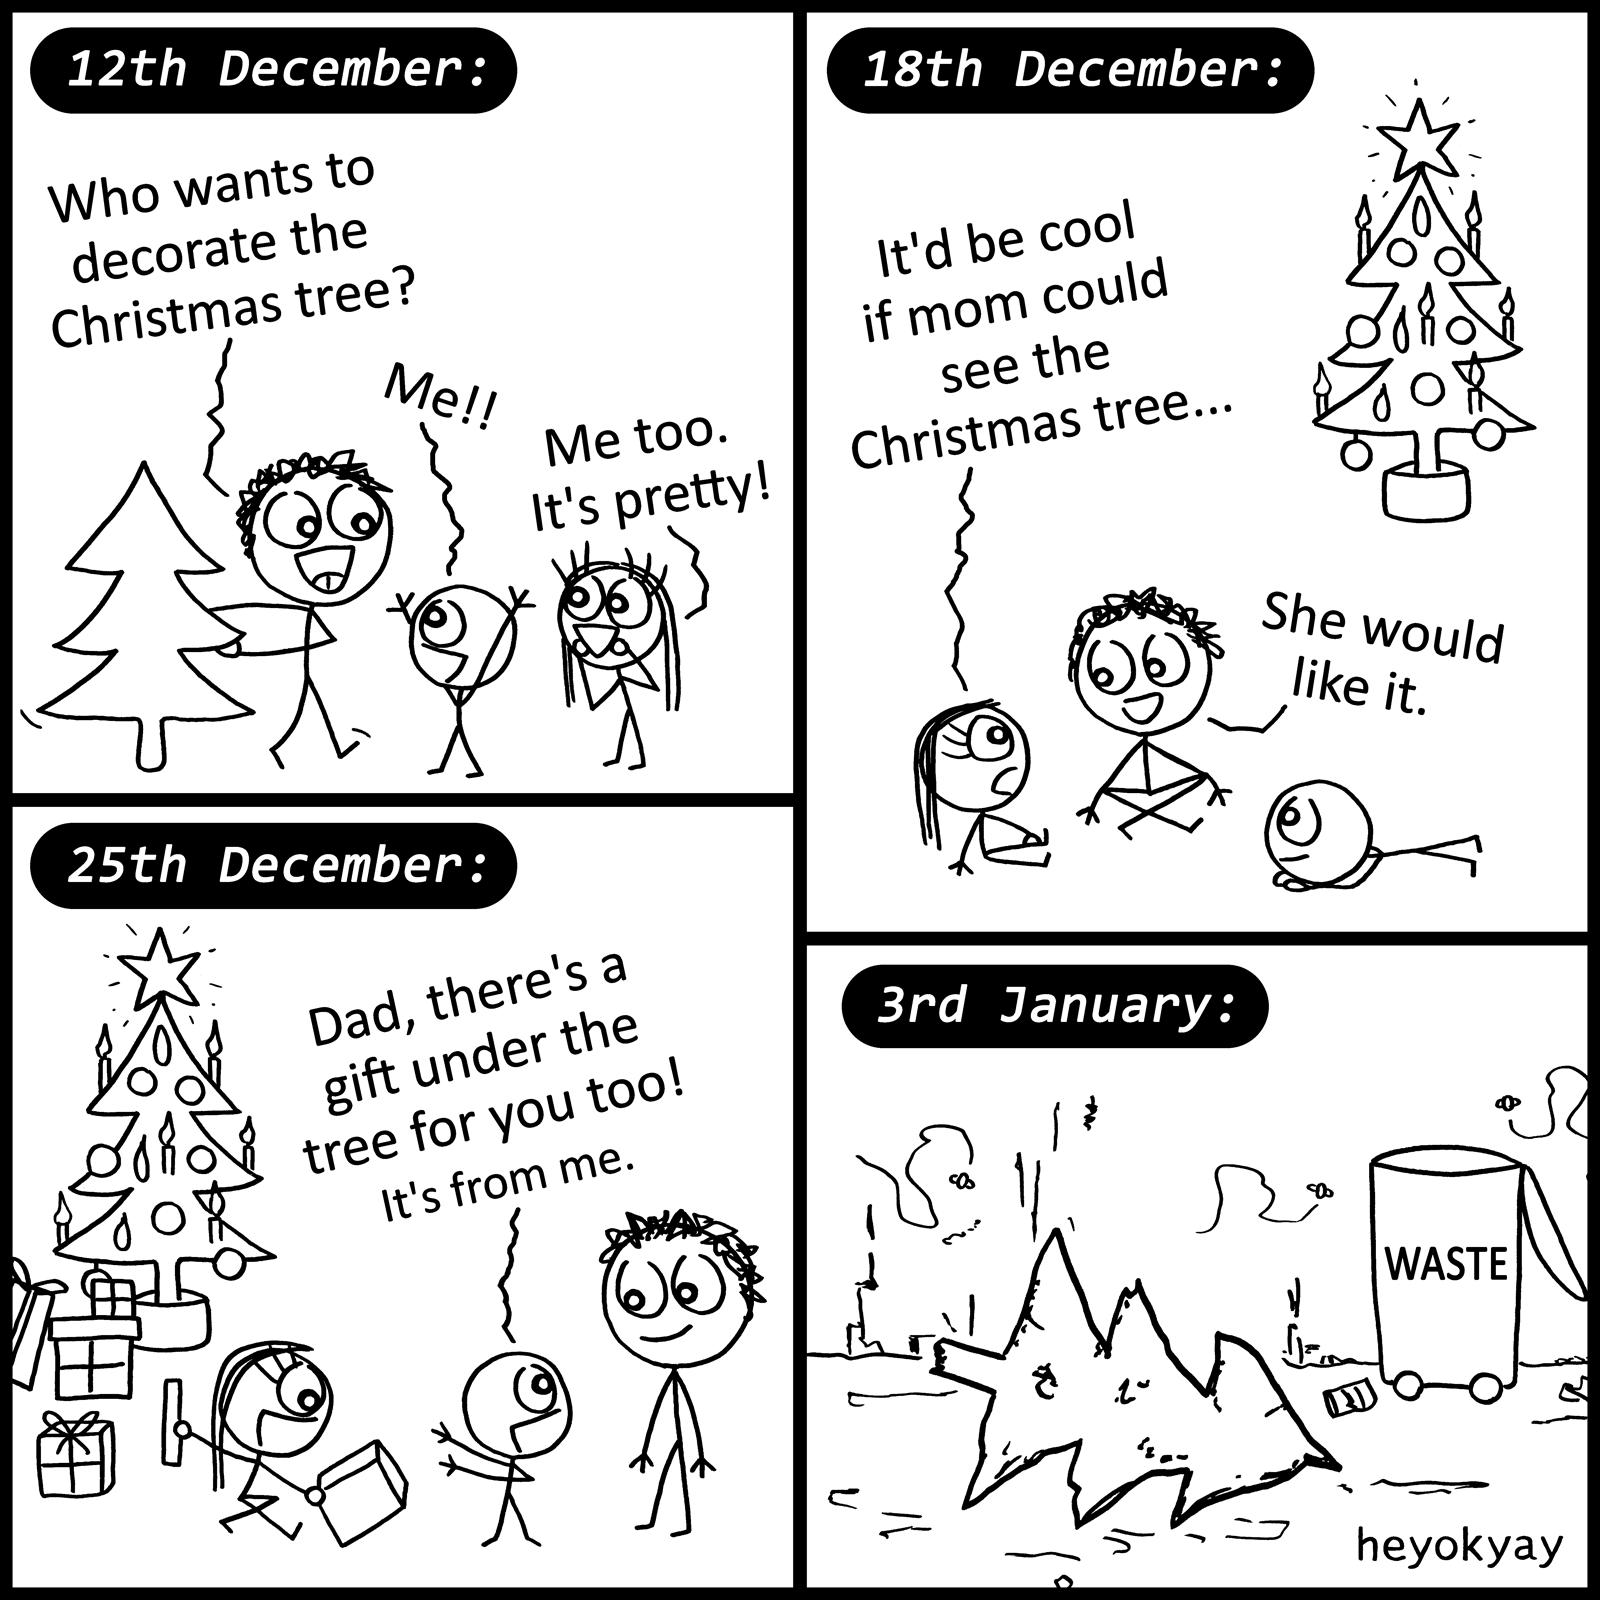 Christmas Tree heyokyay comic